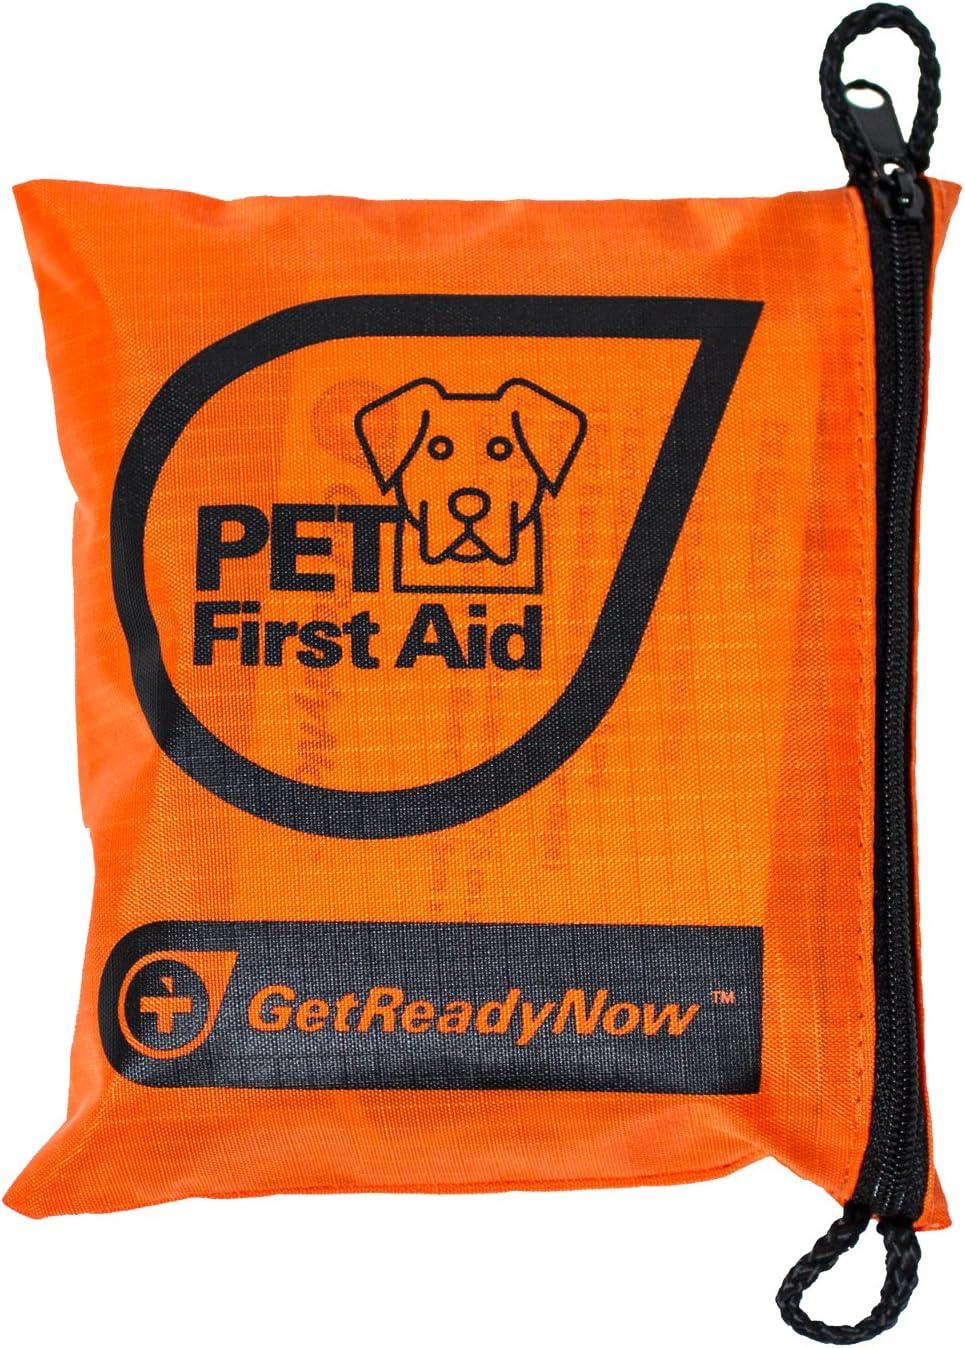 GETREADYNOW Pups & Peeps Emergency Survival Kits